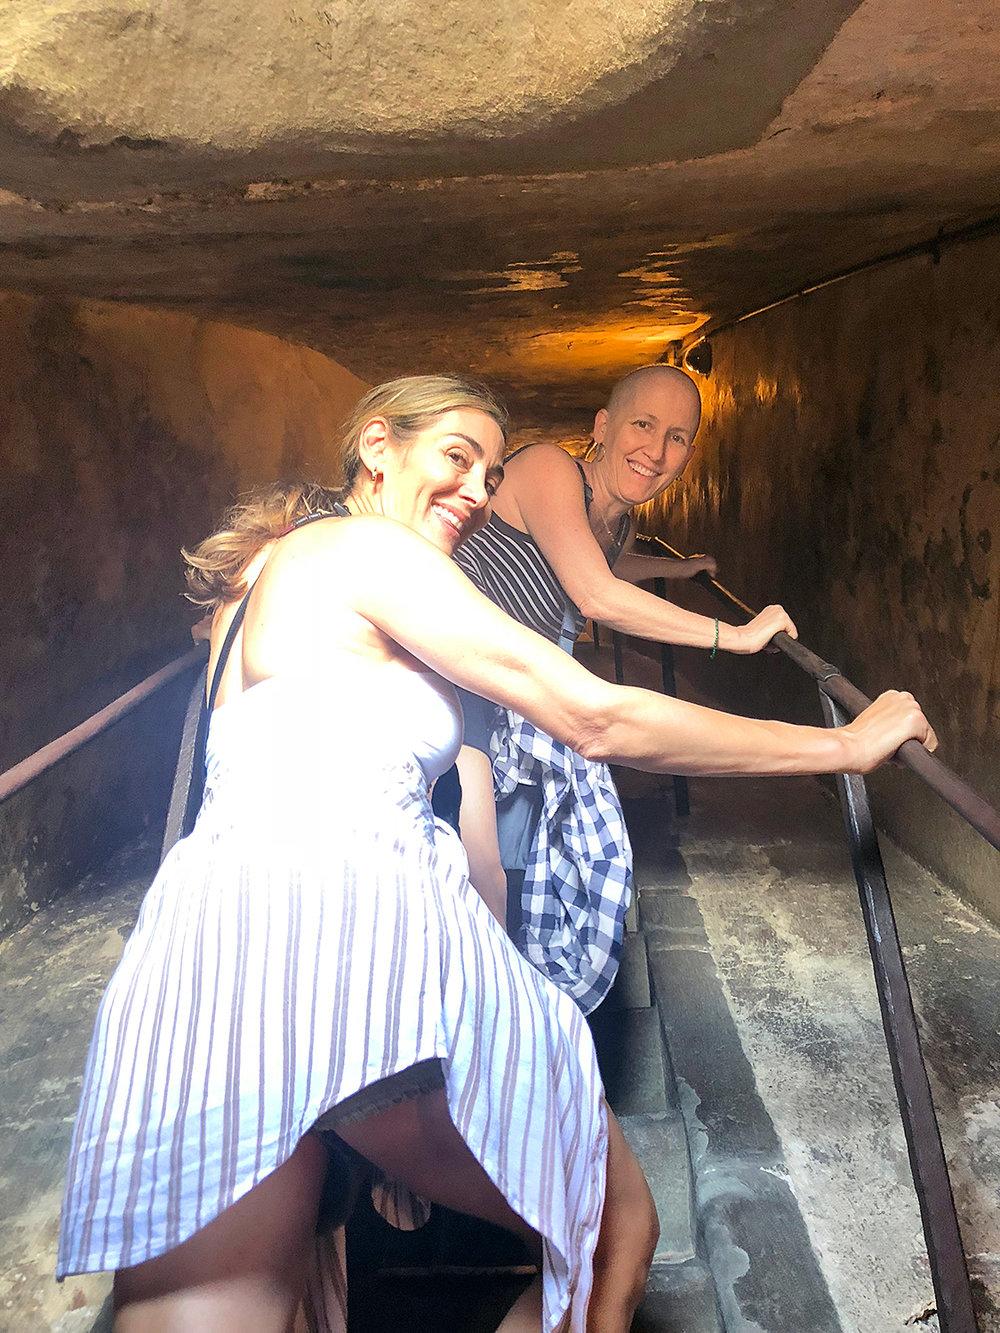 2018-ITALY_firenze_duomo-steps_lisa_sara-up--Recovered.jpg